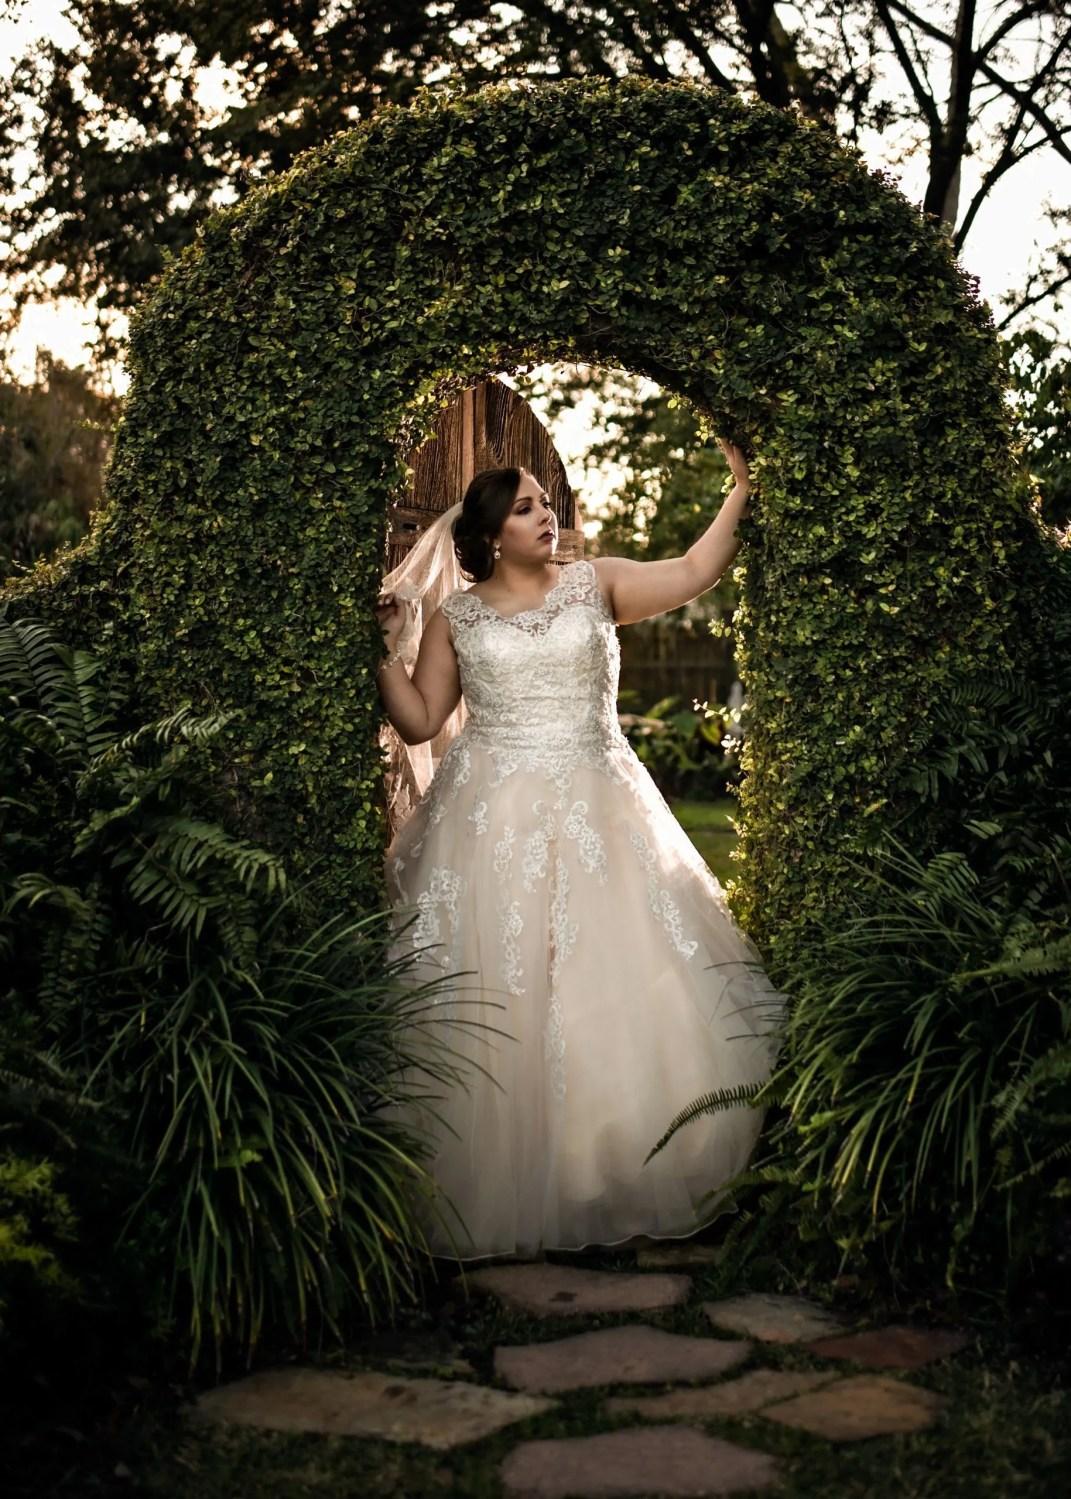 bridal photo shoot in archway at secret garden in sulphur louisiana